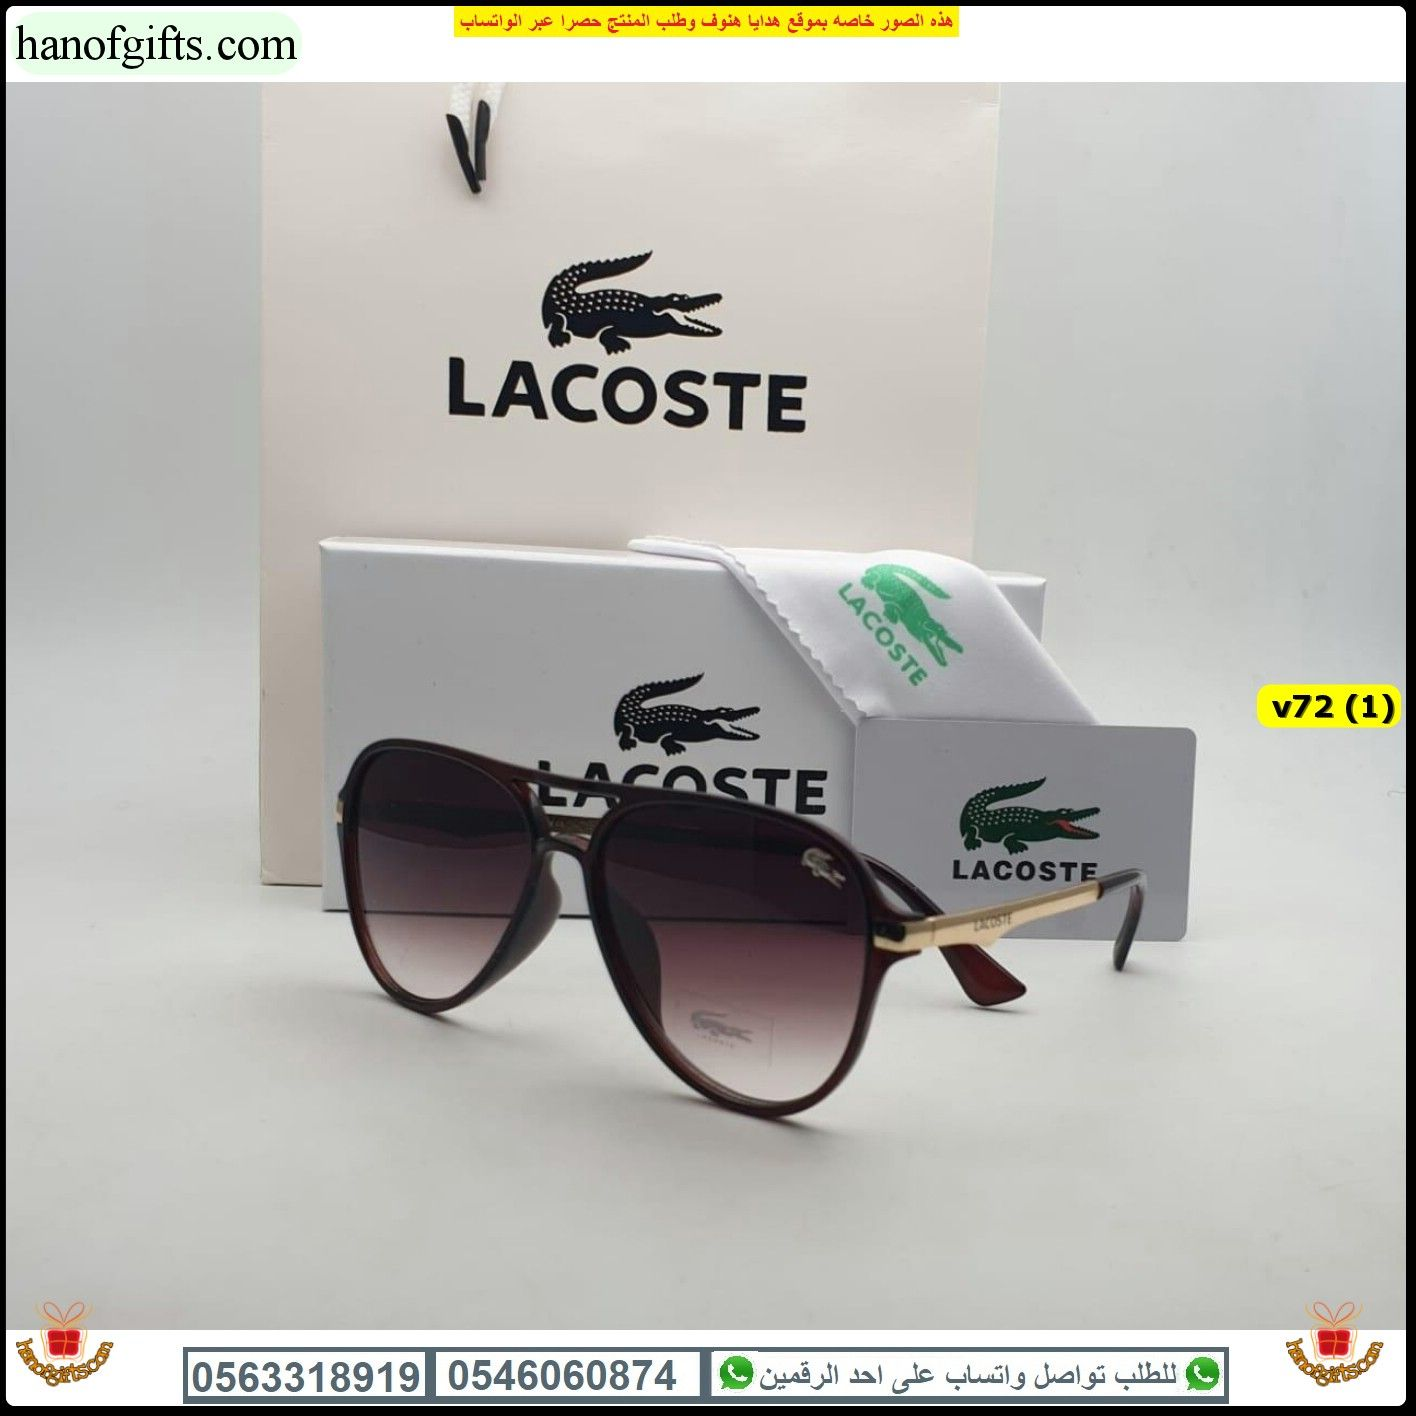 نظارات Lacoste رجالية احصل عليها الان مع الملحقات كيس وعلبة ومنديل وكرت هدايا هنوف Square Sunglass Clubmaster Sunglasses